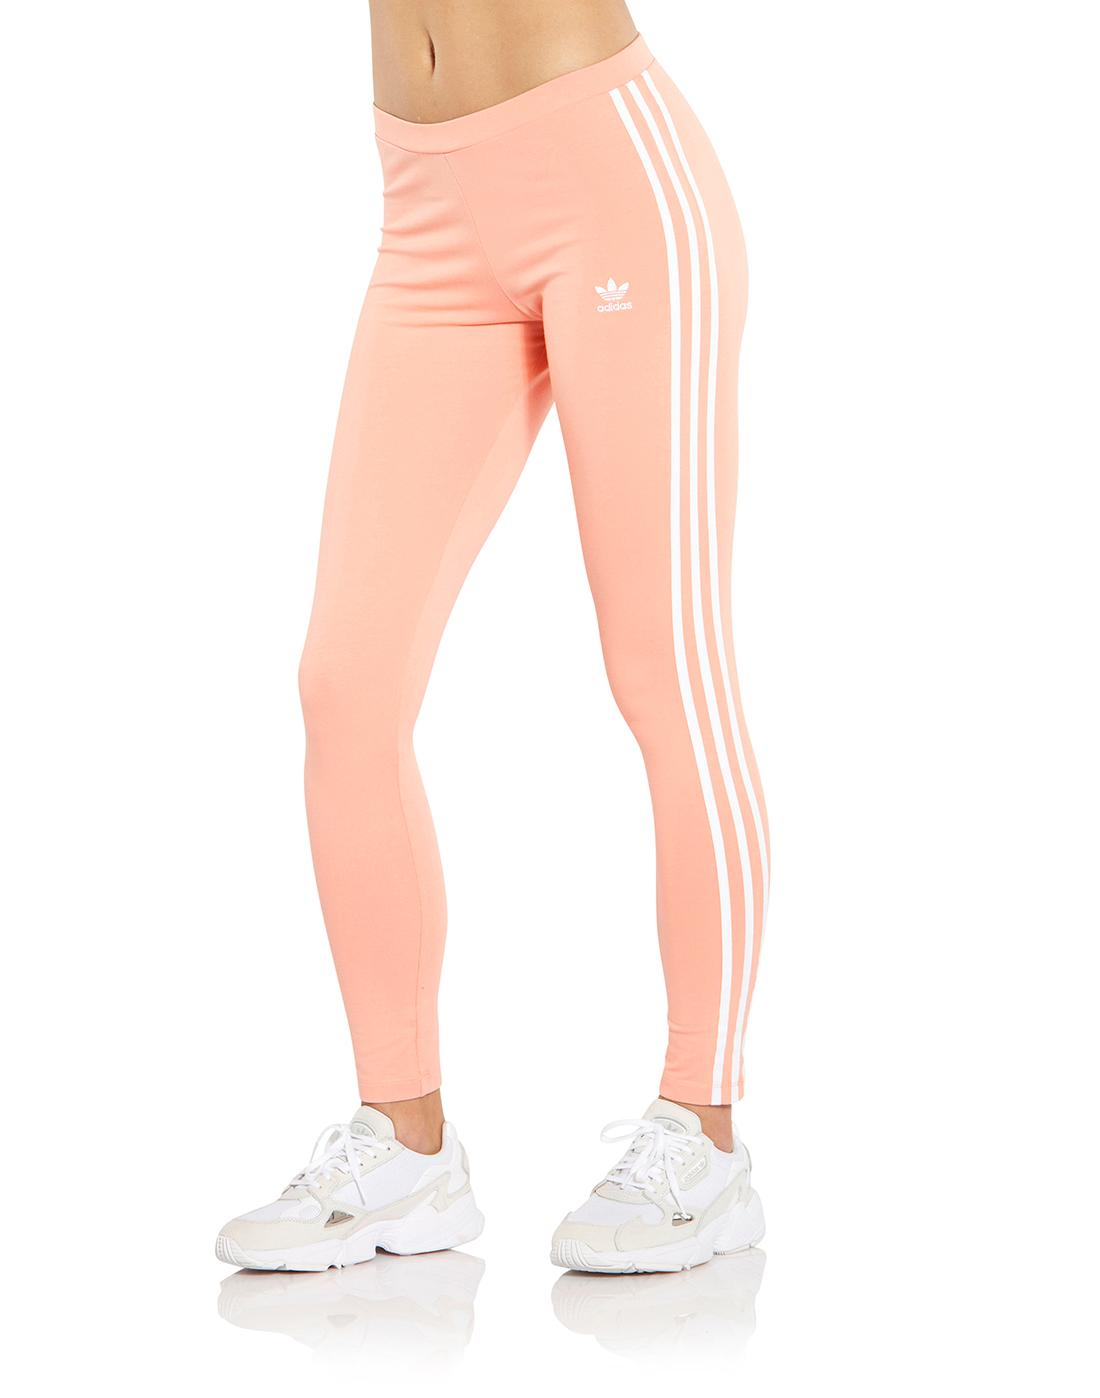 4a3eafc9bea87 Women's Pink adidas Originals Leggings | Life Style Sports